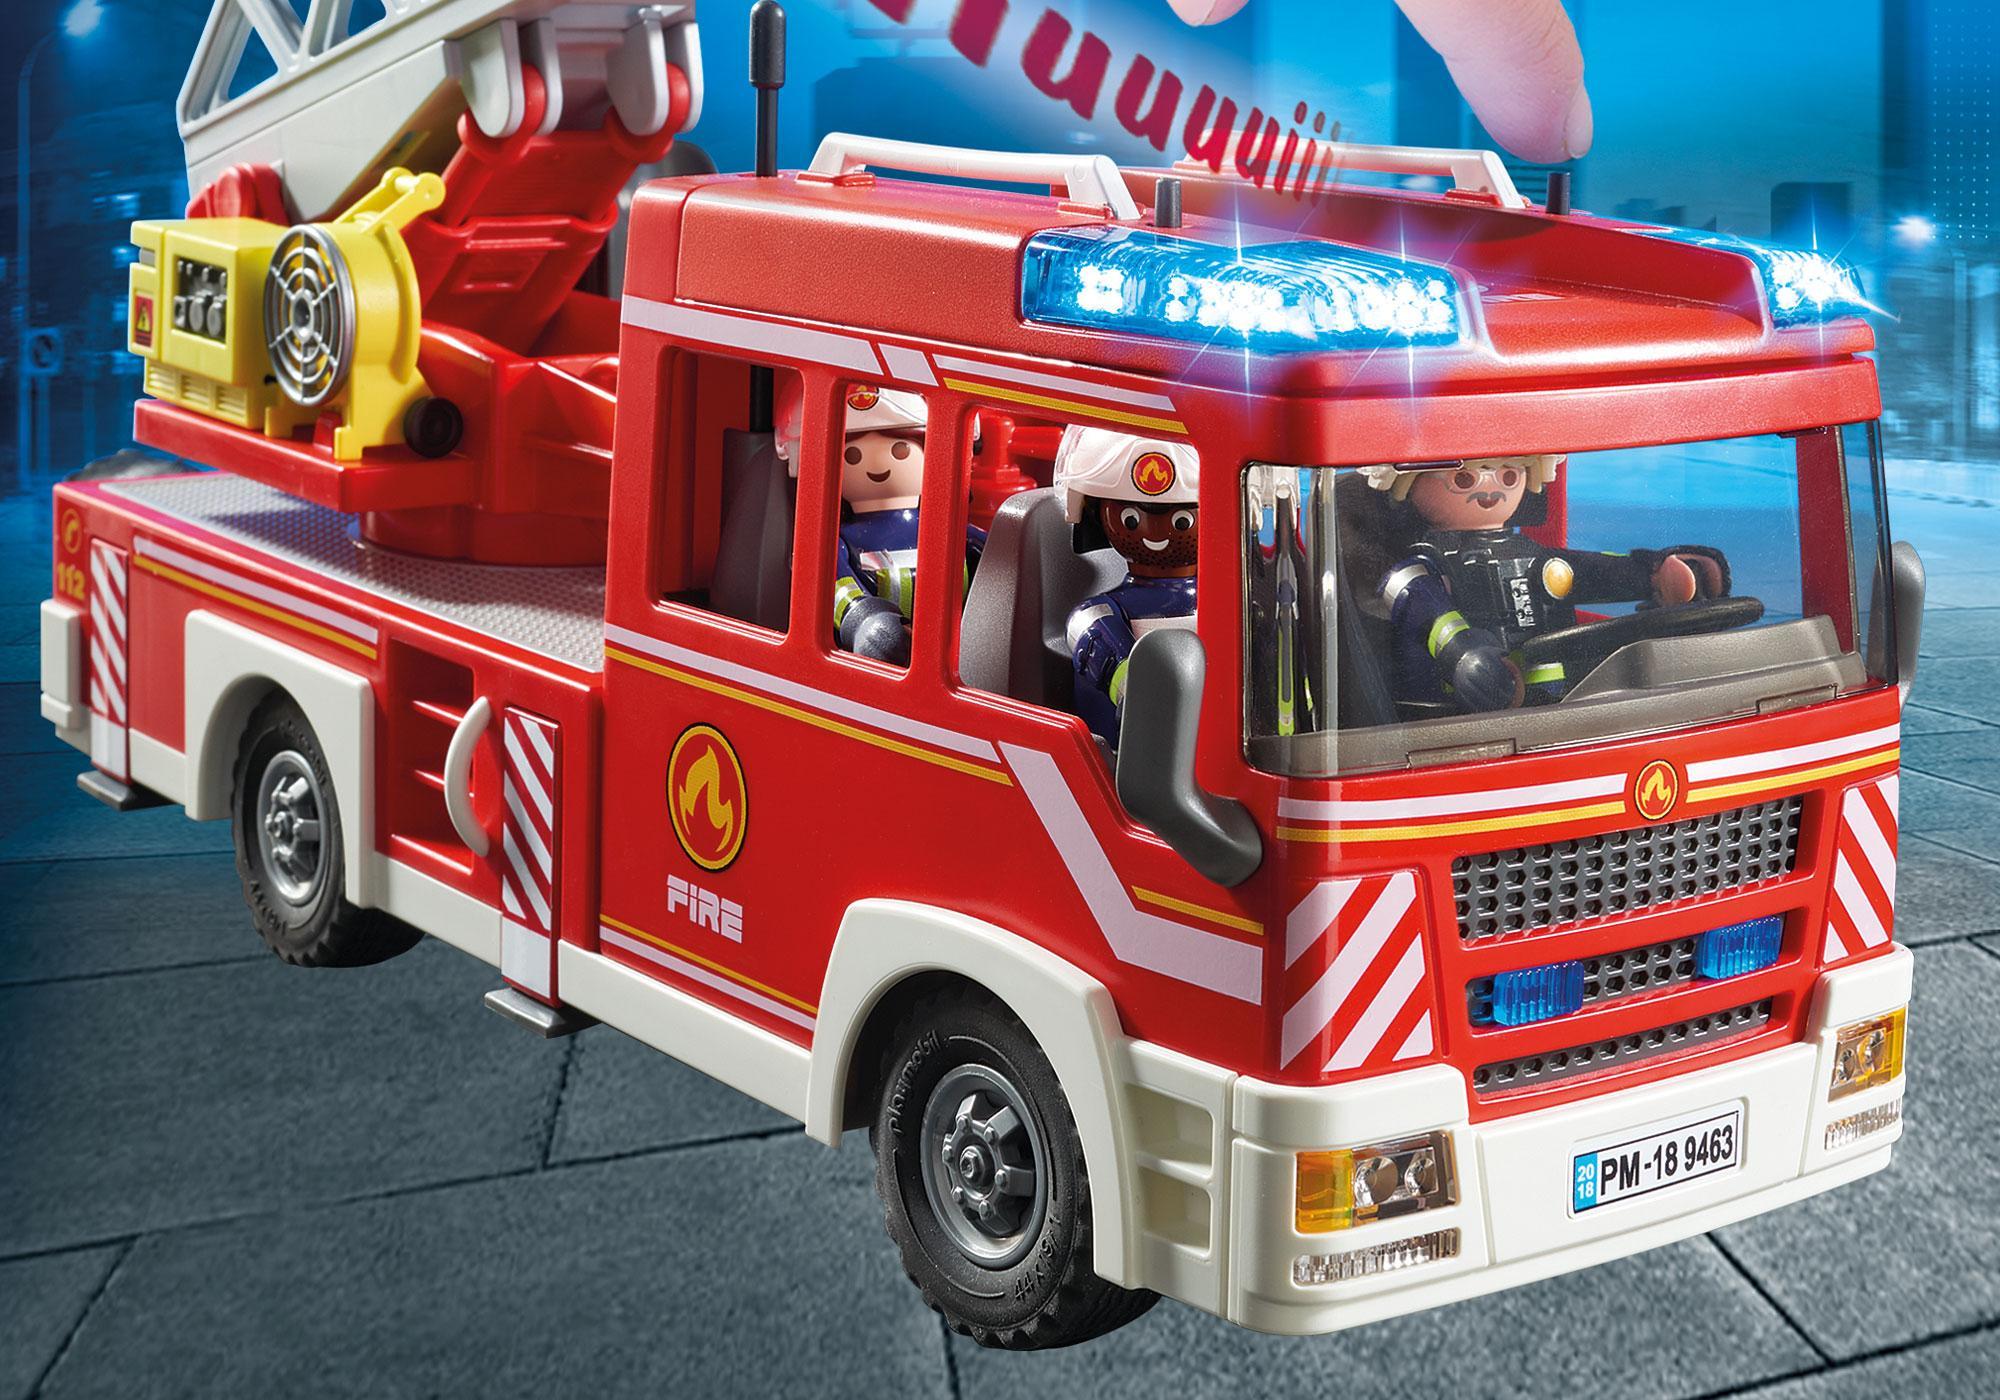 http://media.playmobil.com/i/playmobil/9463_product_extra1/Όχημα Πυροσβεστικής με σκάλα και καλάθι διάσωσης